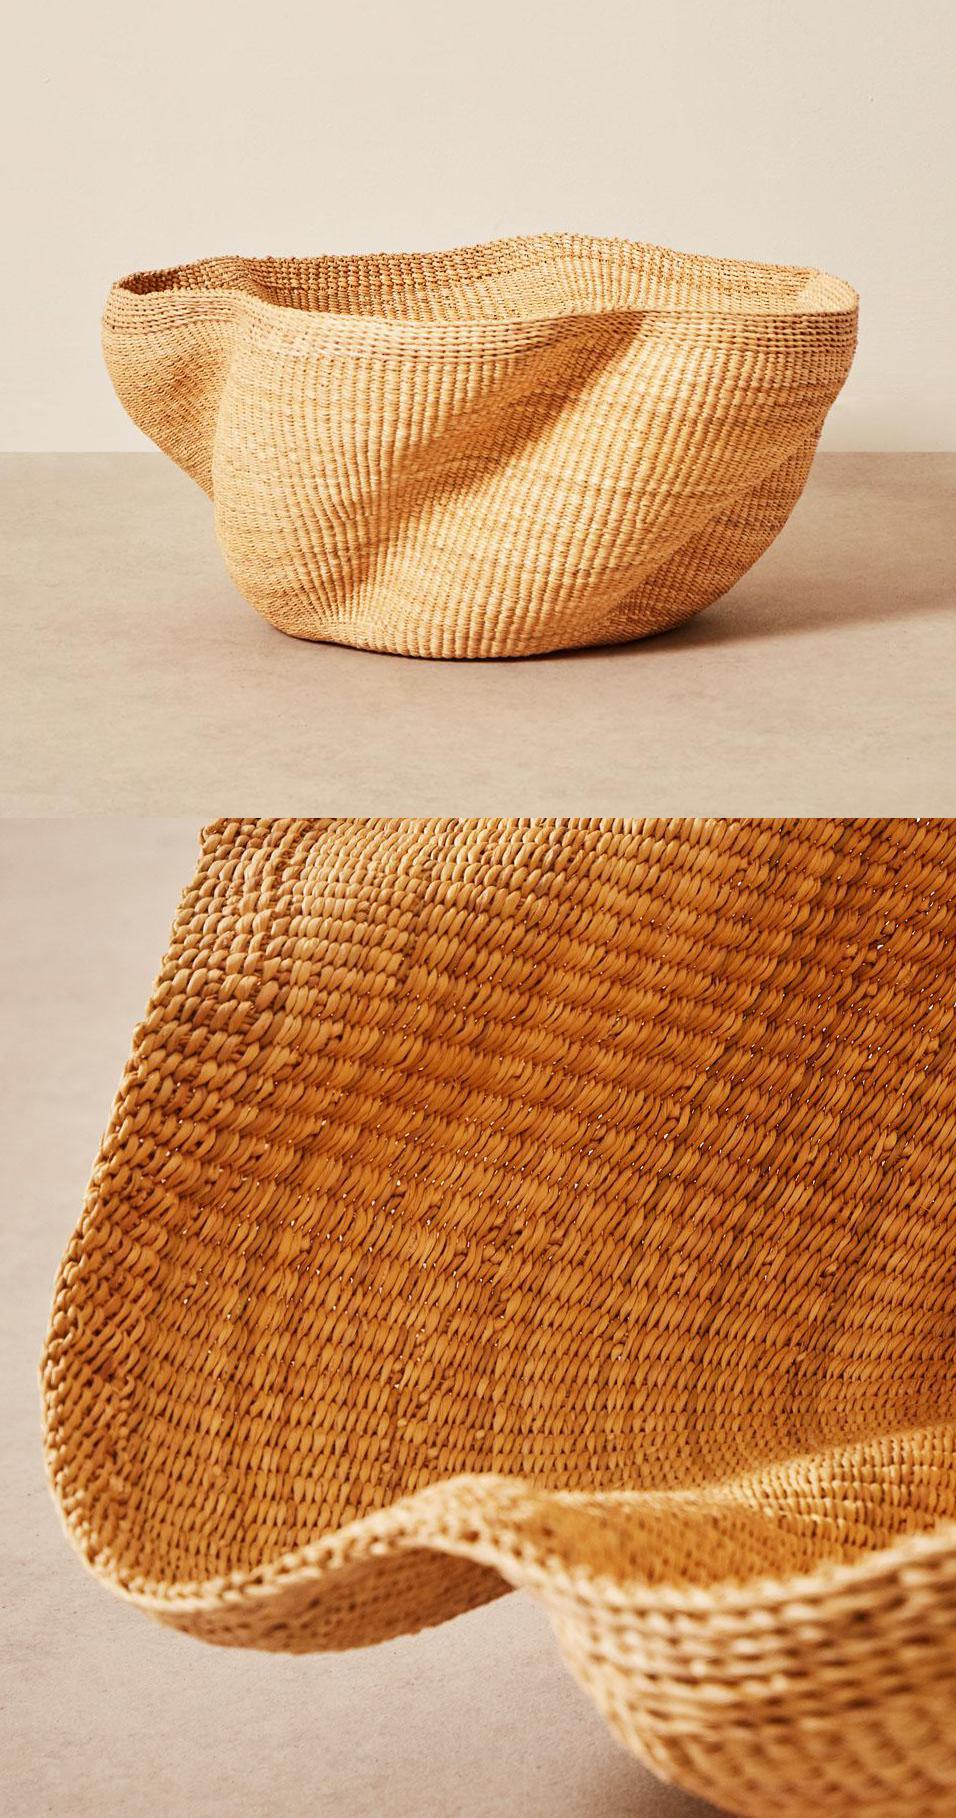 Fair Trade Baskets and Woven Bowls - Pakurigo Basket